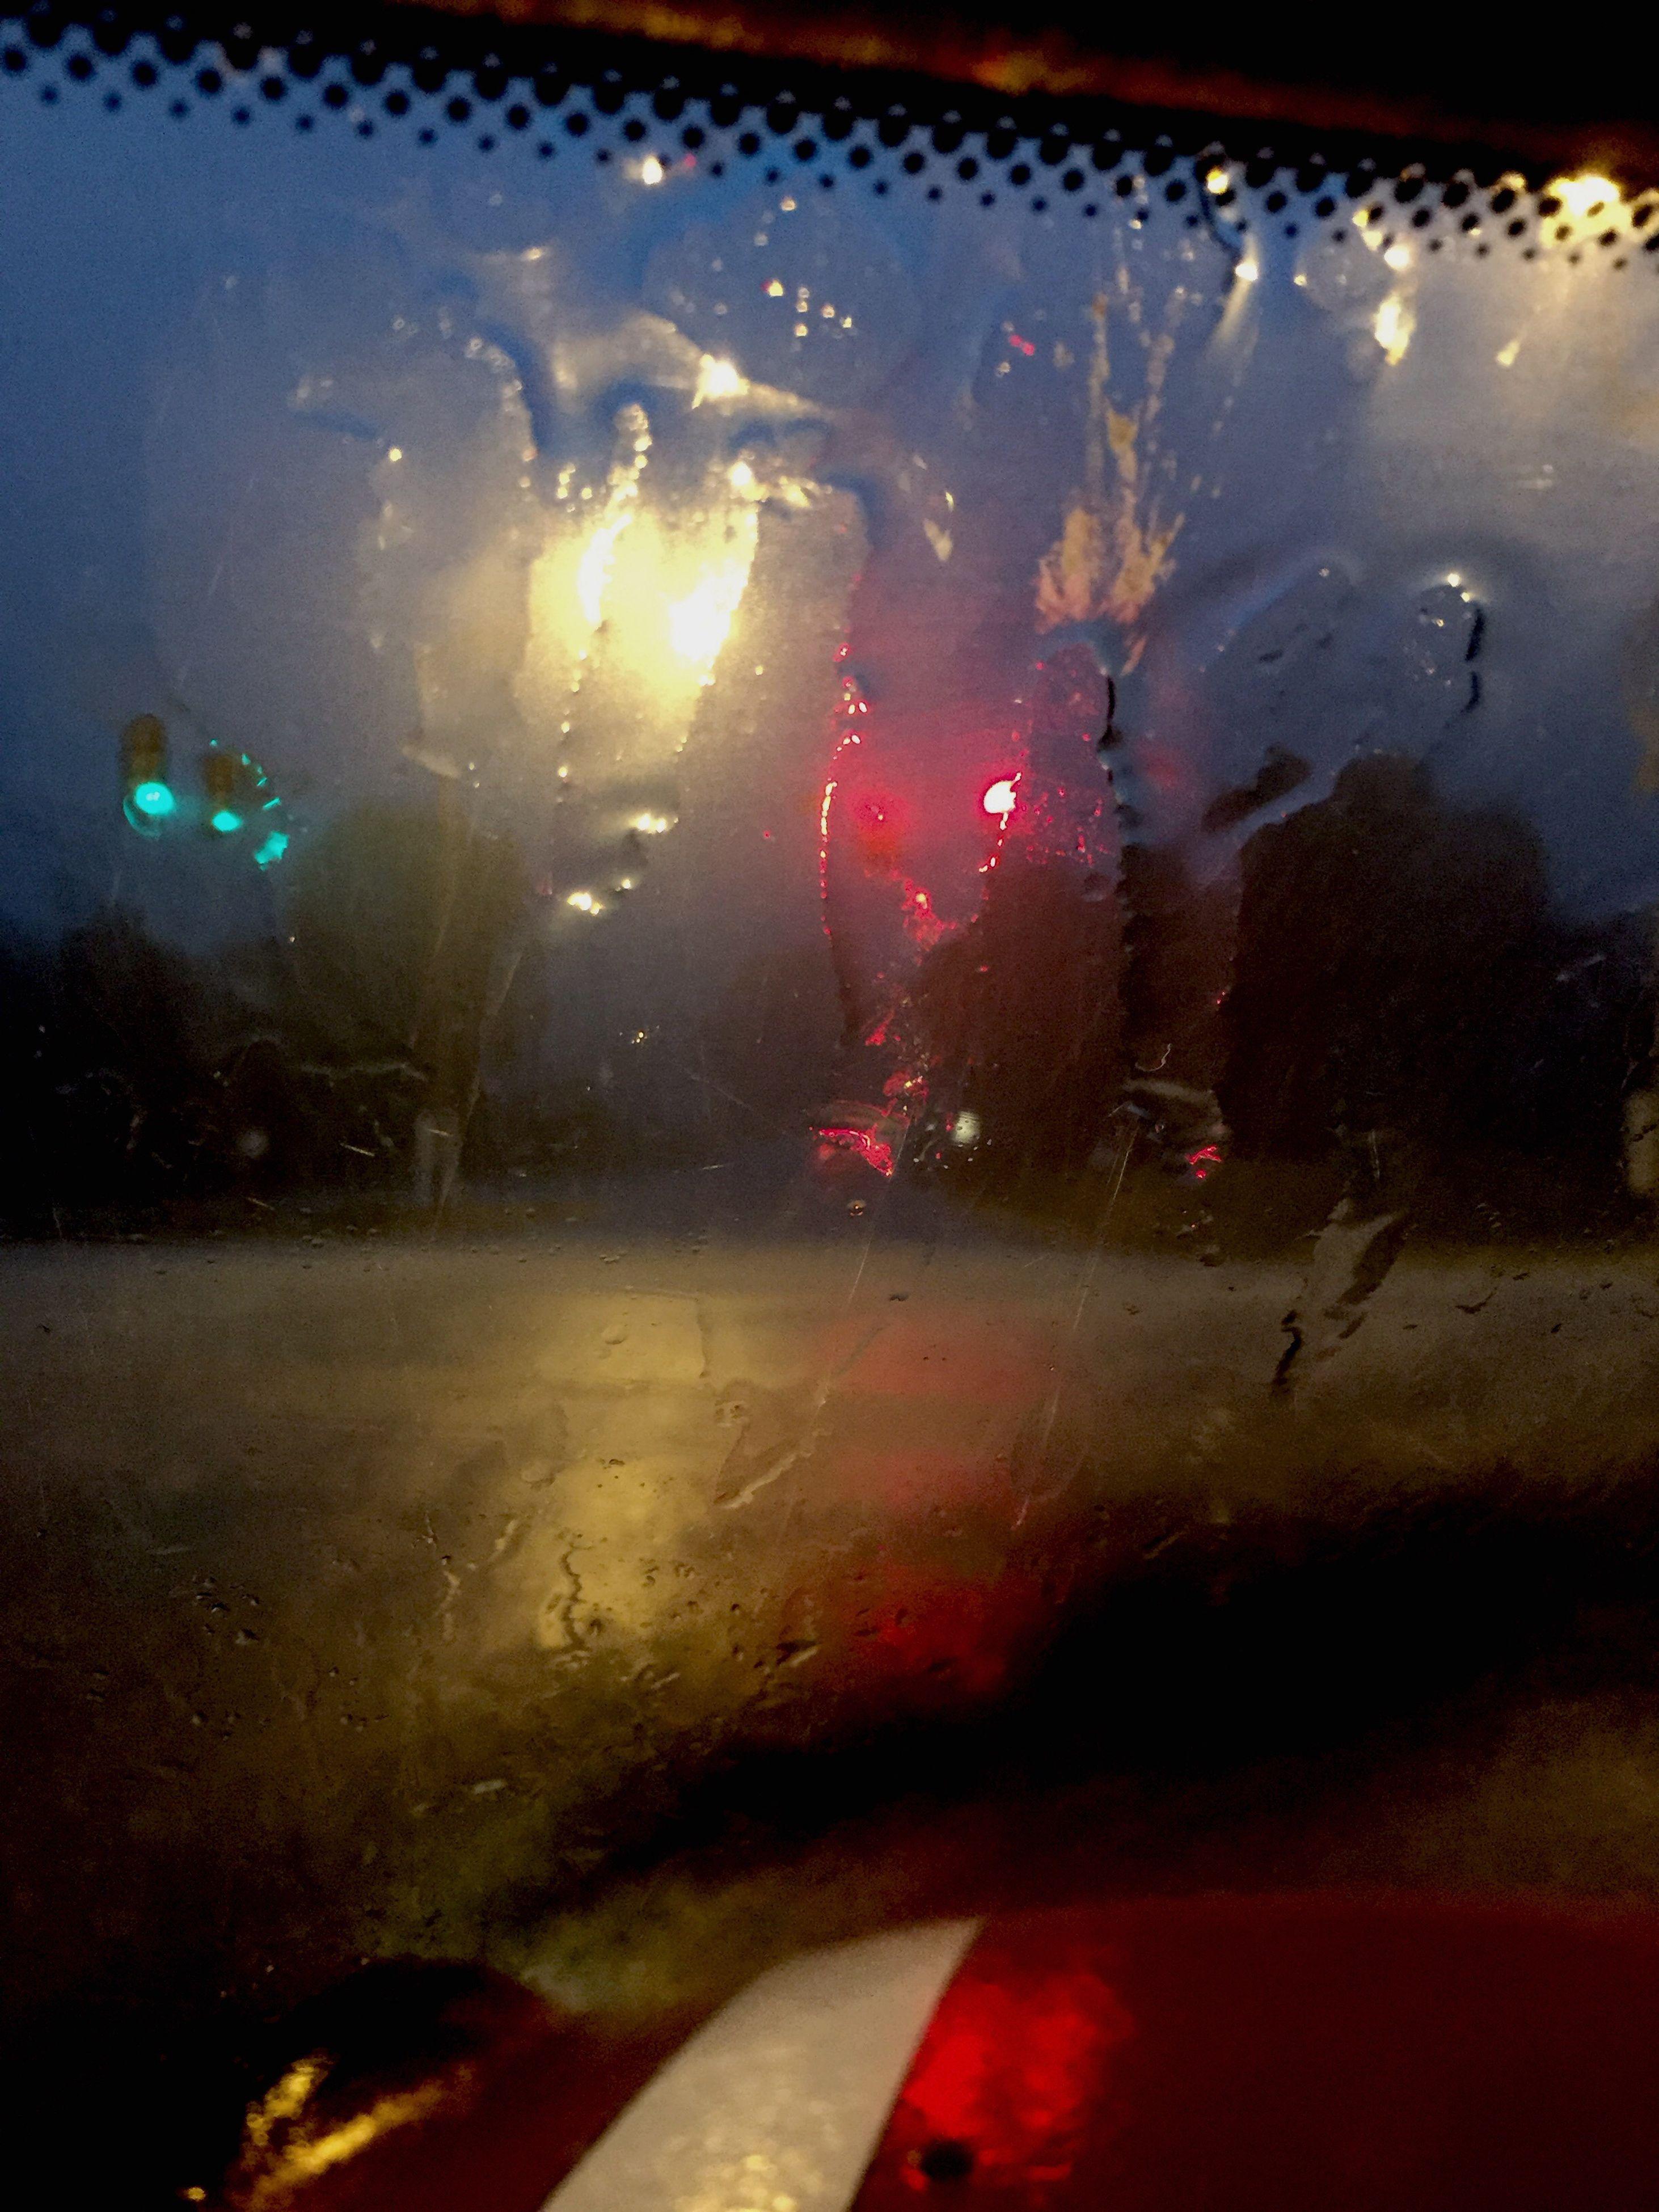 glass - material, wet, window, transportation, transparent, drop, vehicle interior, water, rain, land vehicle, reflection, car, no people, night, rainy season, car interior, close-up, illuminated, outdoors, sky, raindrop, frosted glass